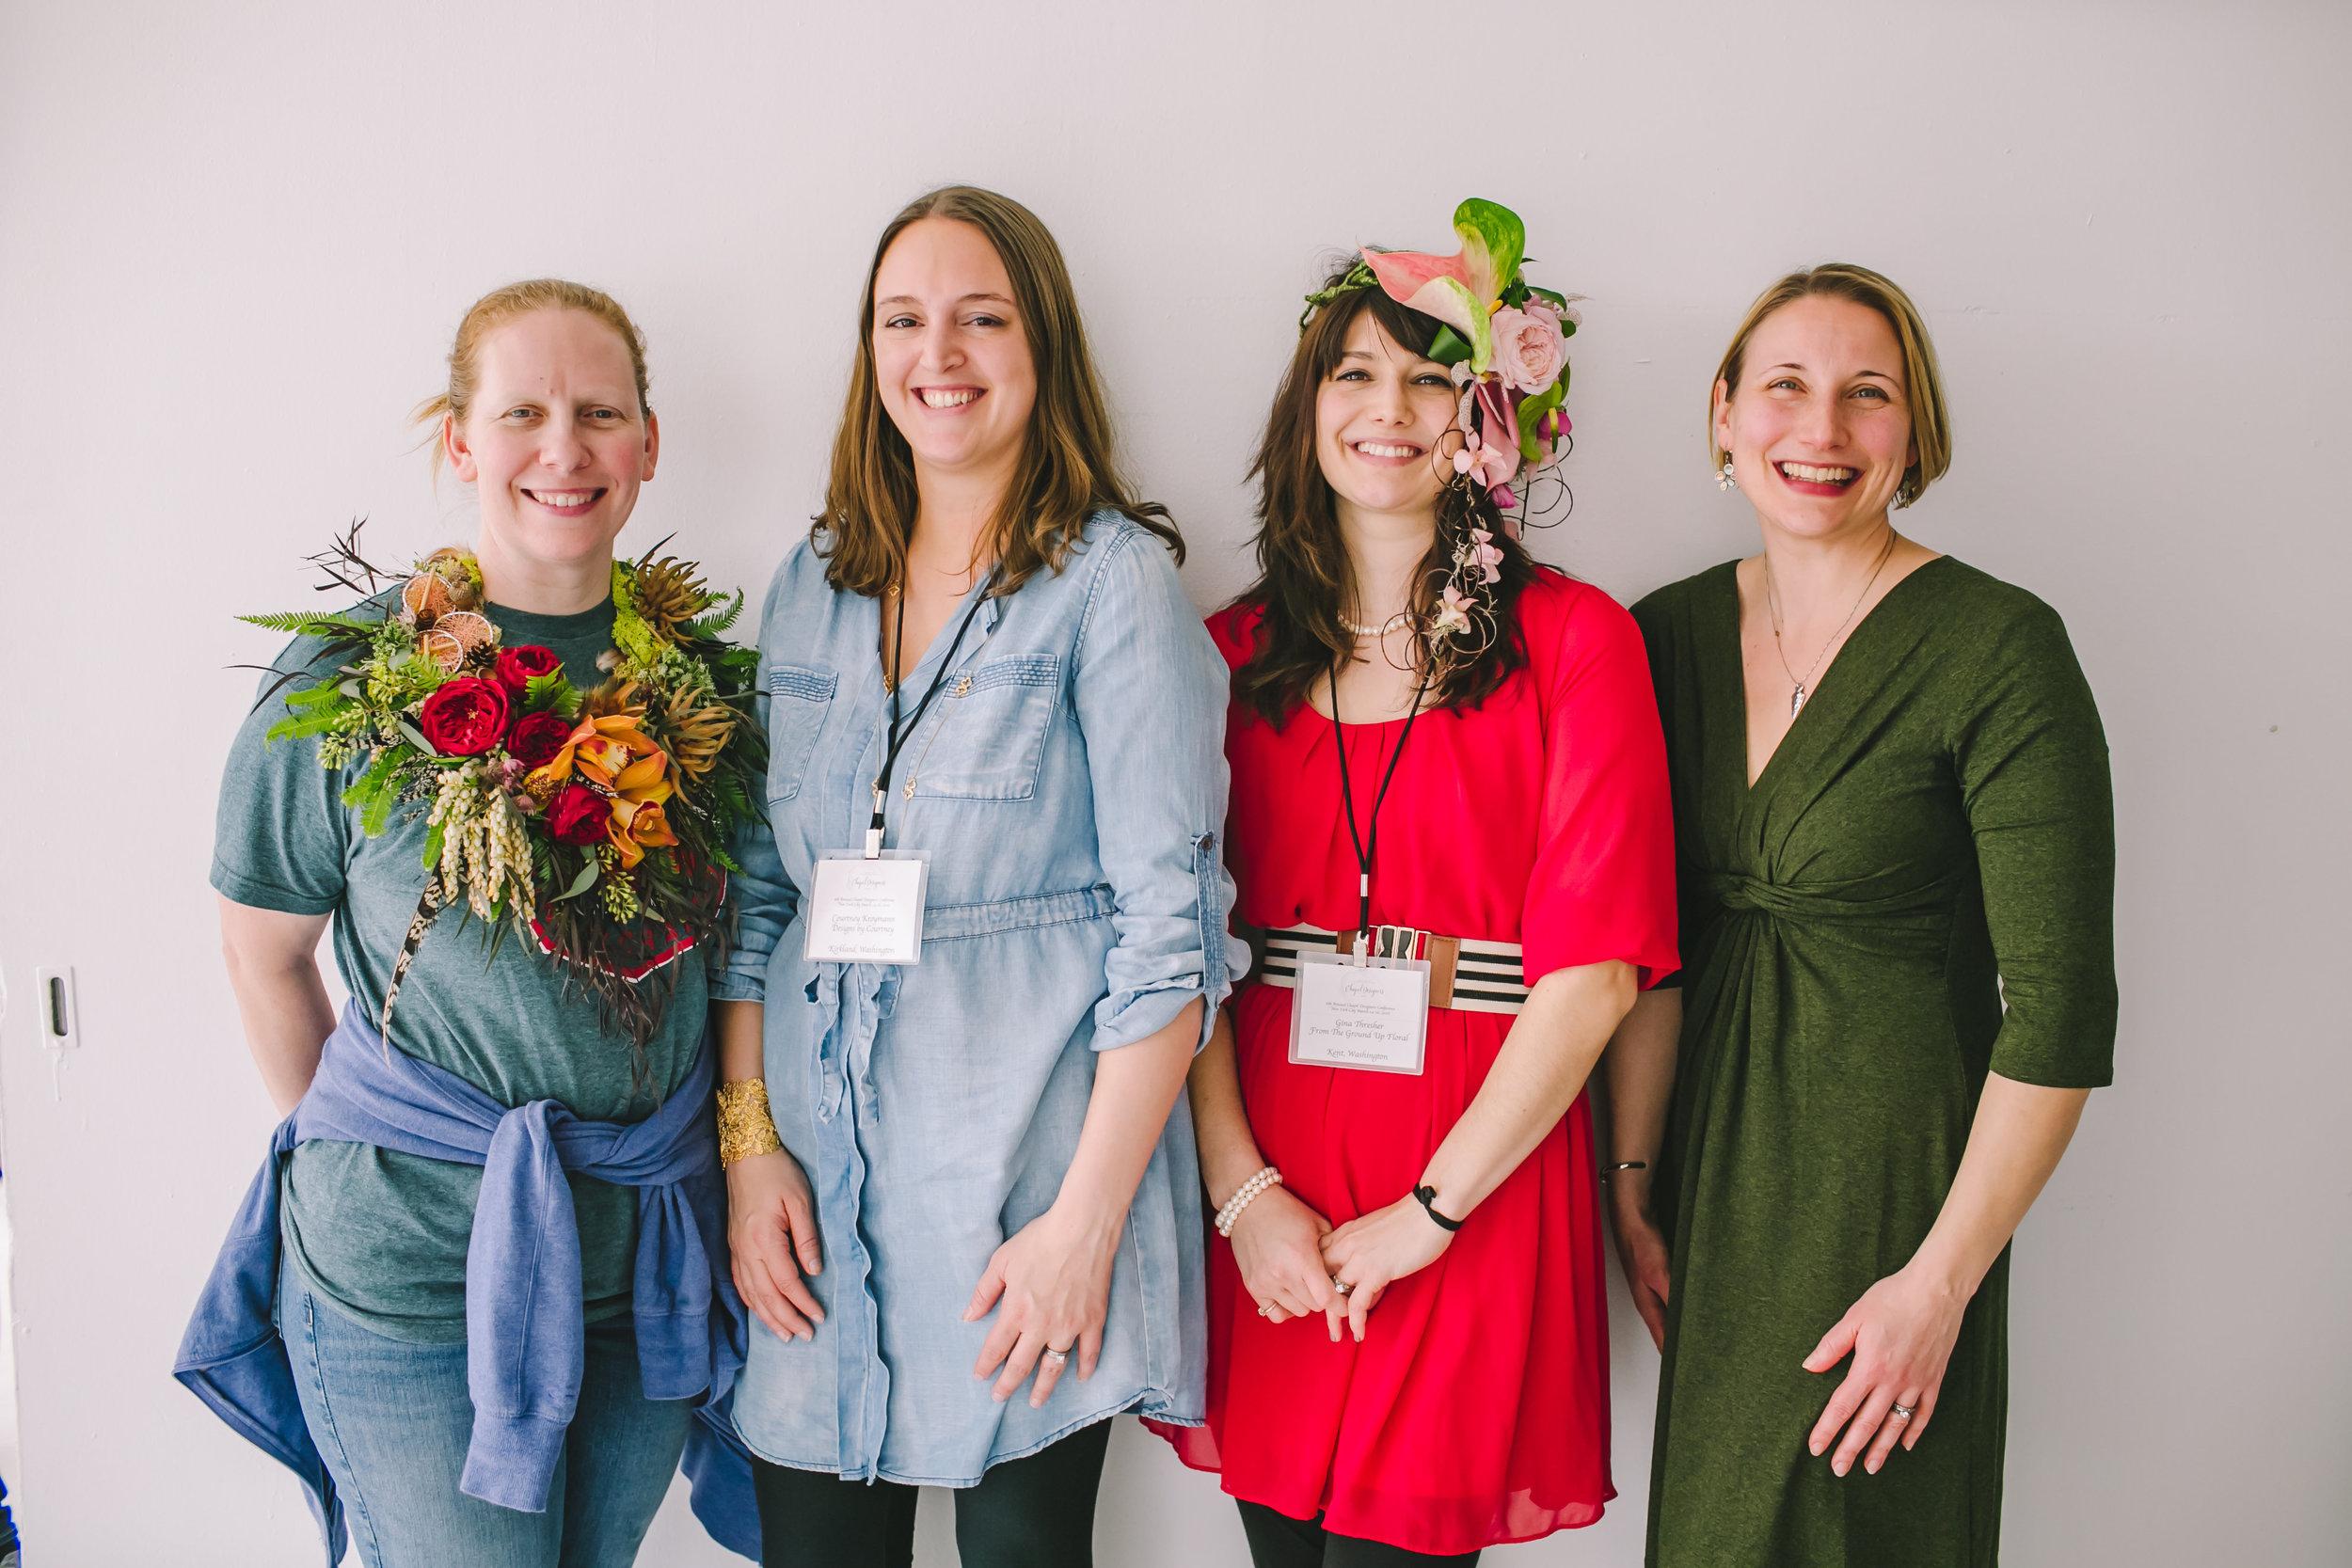 Andrea Grist, Courtney Kroymann, Gina Thresher, Alison Ellis- Chapel Designers NYC 2016 Photo:  Amanda Domouchelle